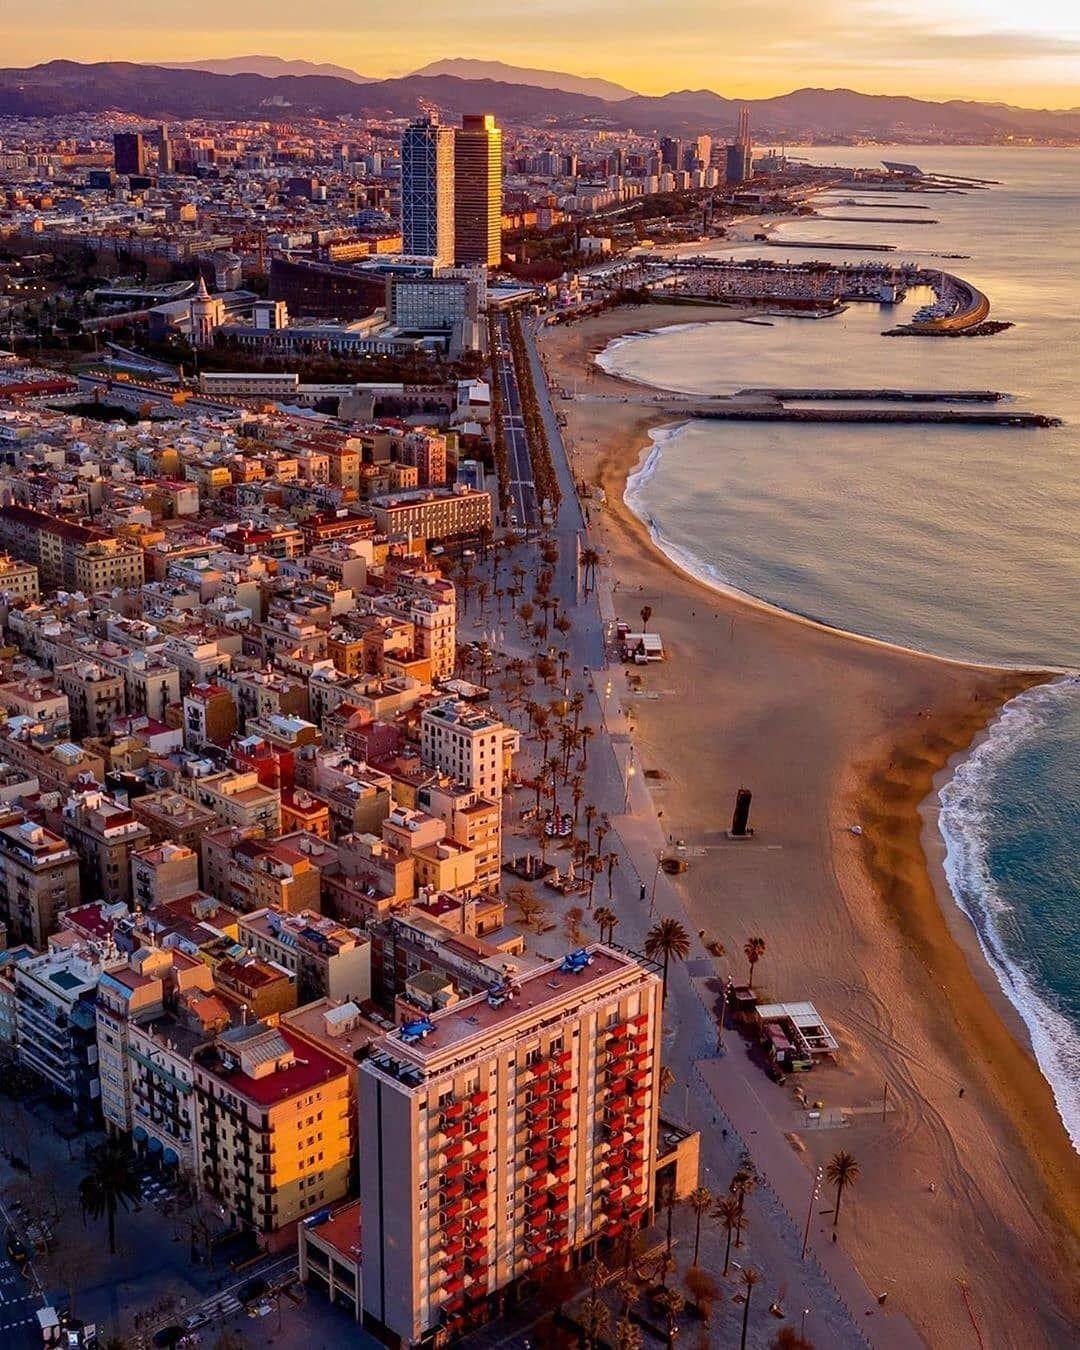 Best views Barcelona😘👍 #barcelona #italya #bestvacations #bestview #best #travelawesome #traveller #travelling #travel...